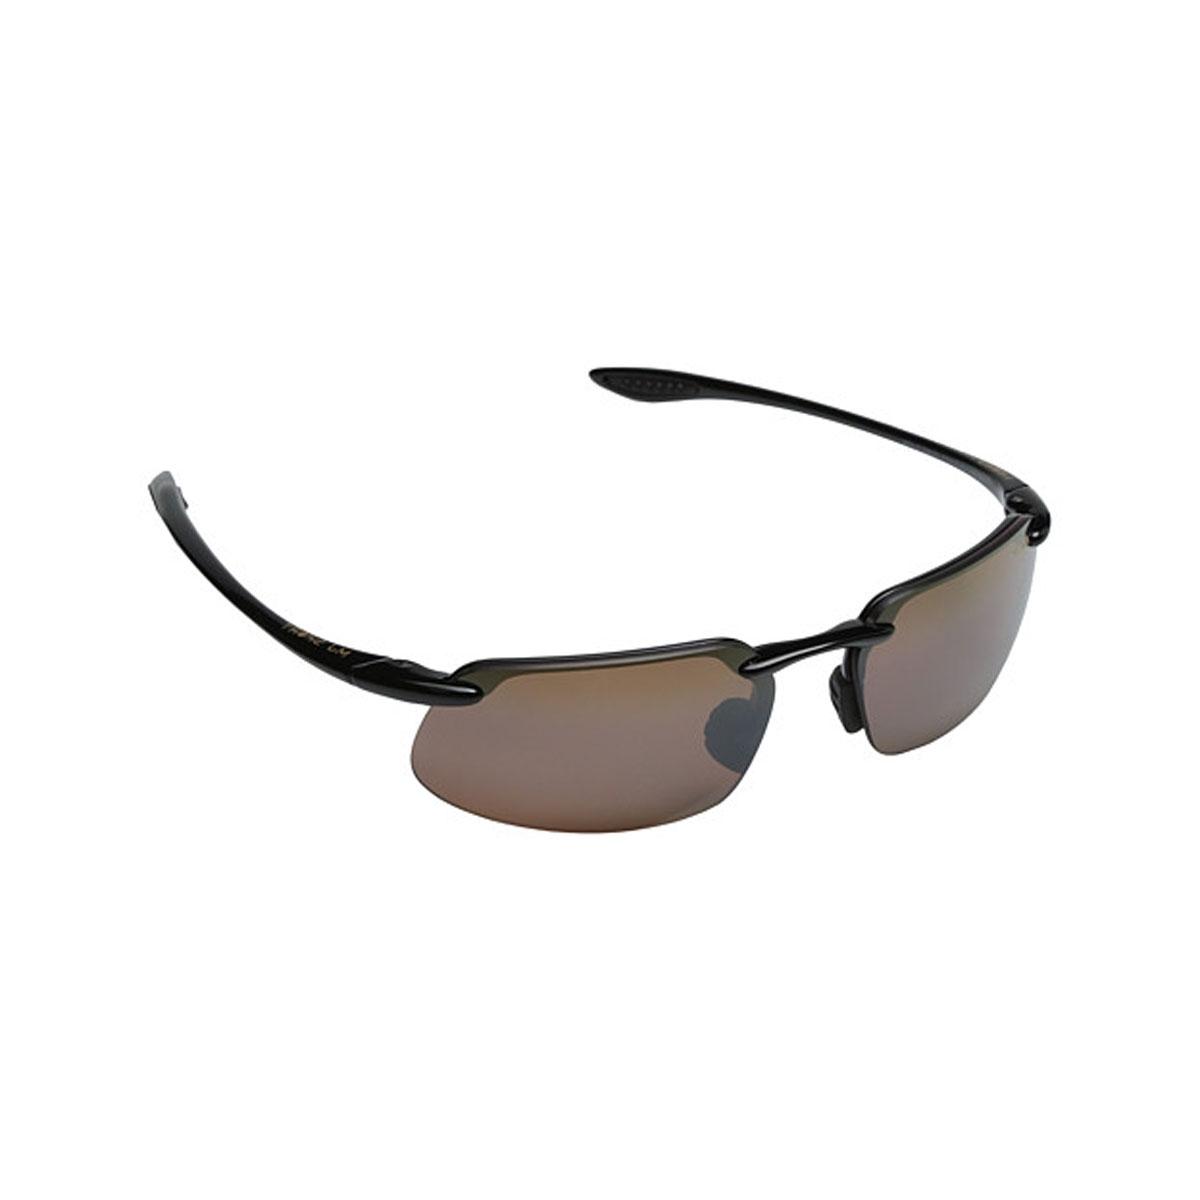 Maui jim kanaha sunglasses hcl bronze lens for Maui jim fishing sunglasses